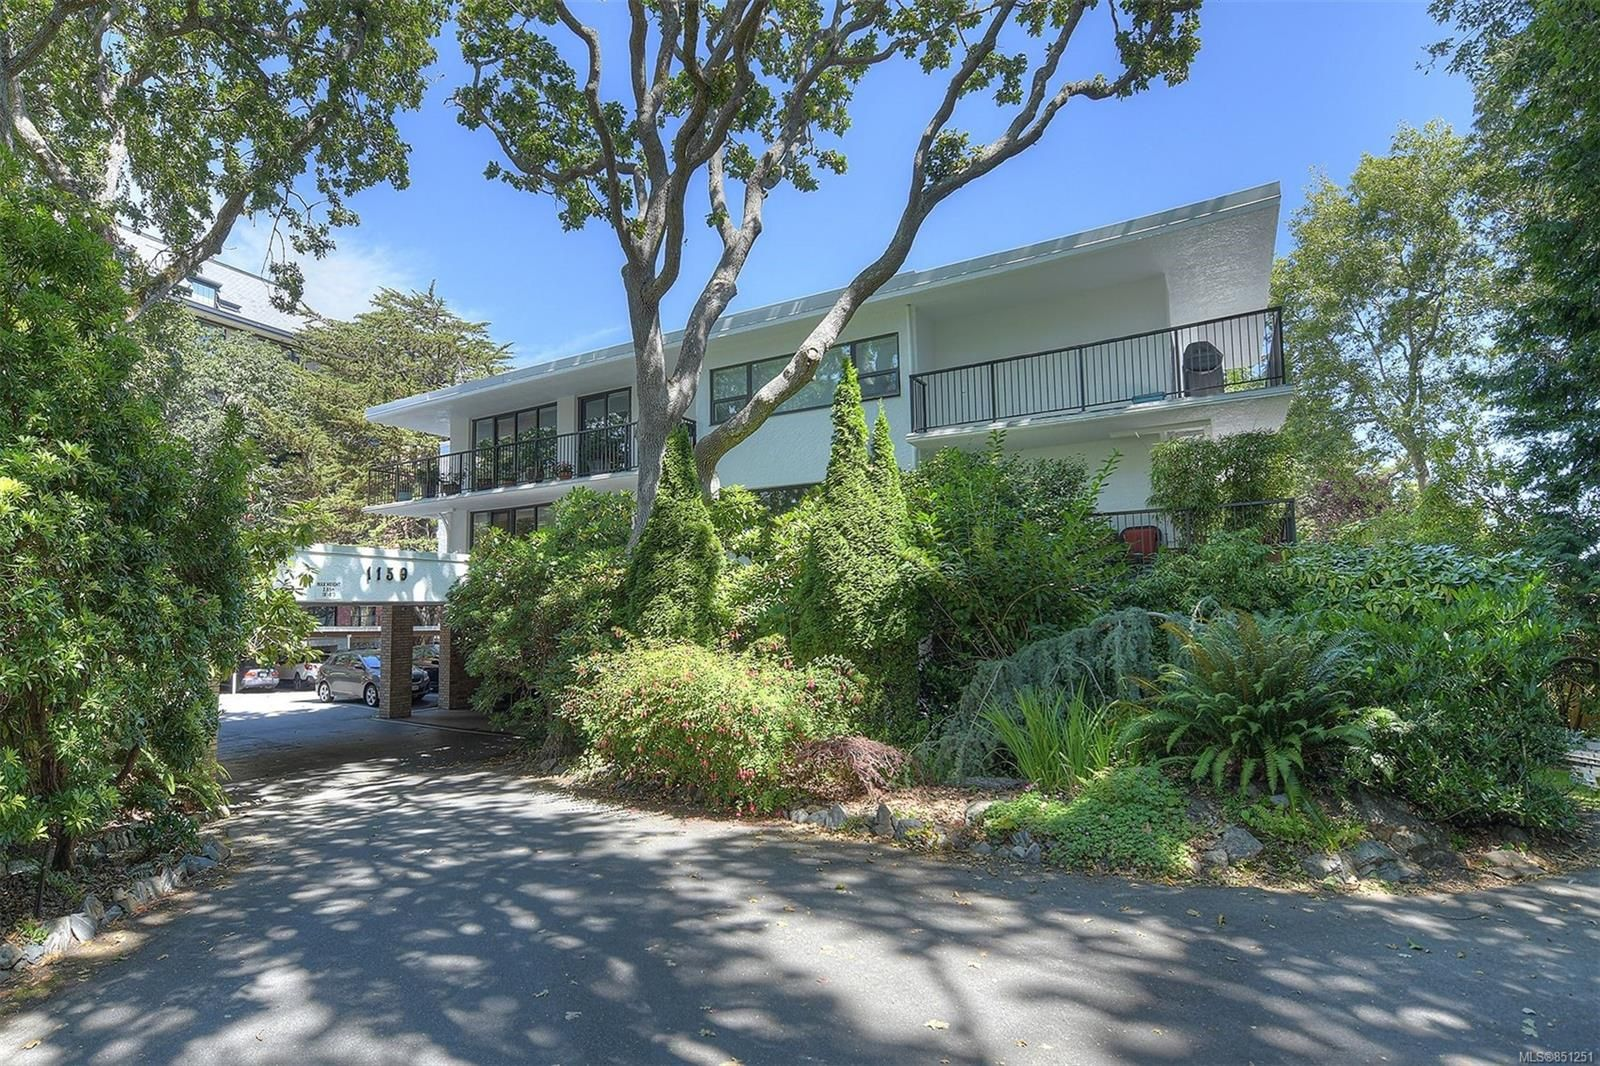 Main Photo: 406 1159 Beach Dr in : OB South Oak Bay Condo for sale (Oak Bay)  : MLS®# 851251